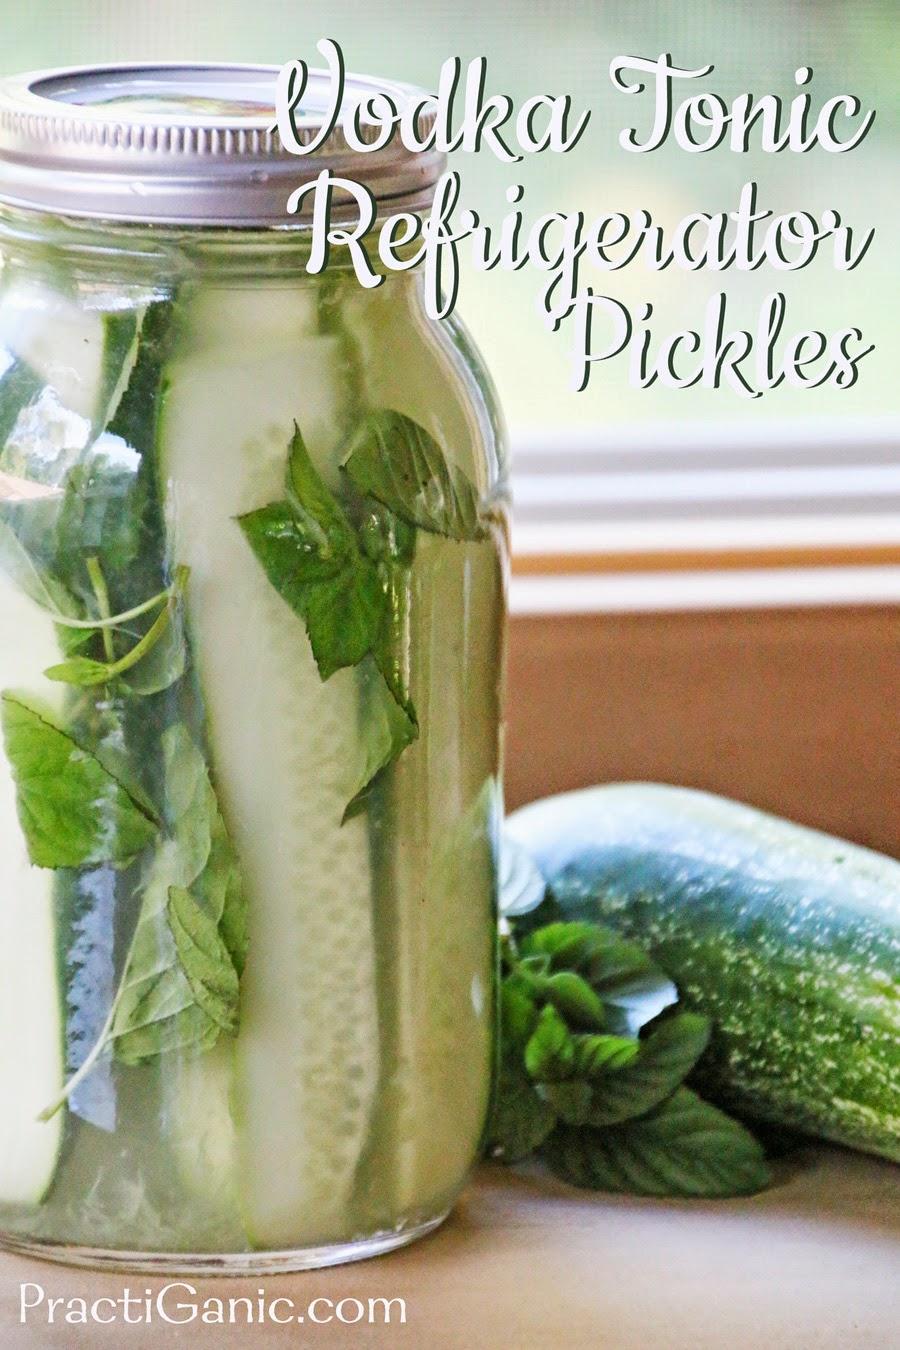 Vodka Tonic Refrigerator Pickles